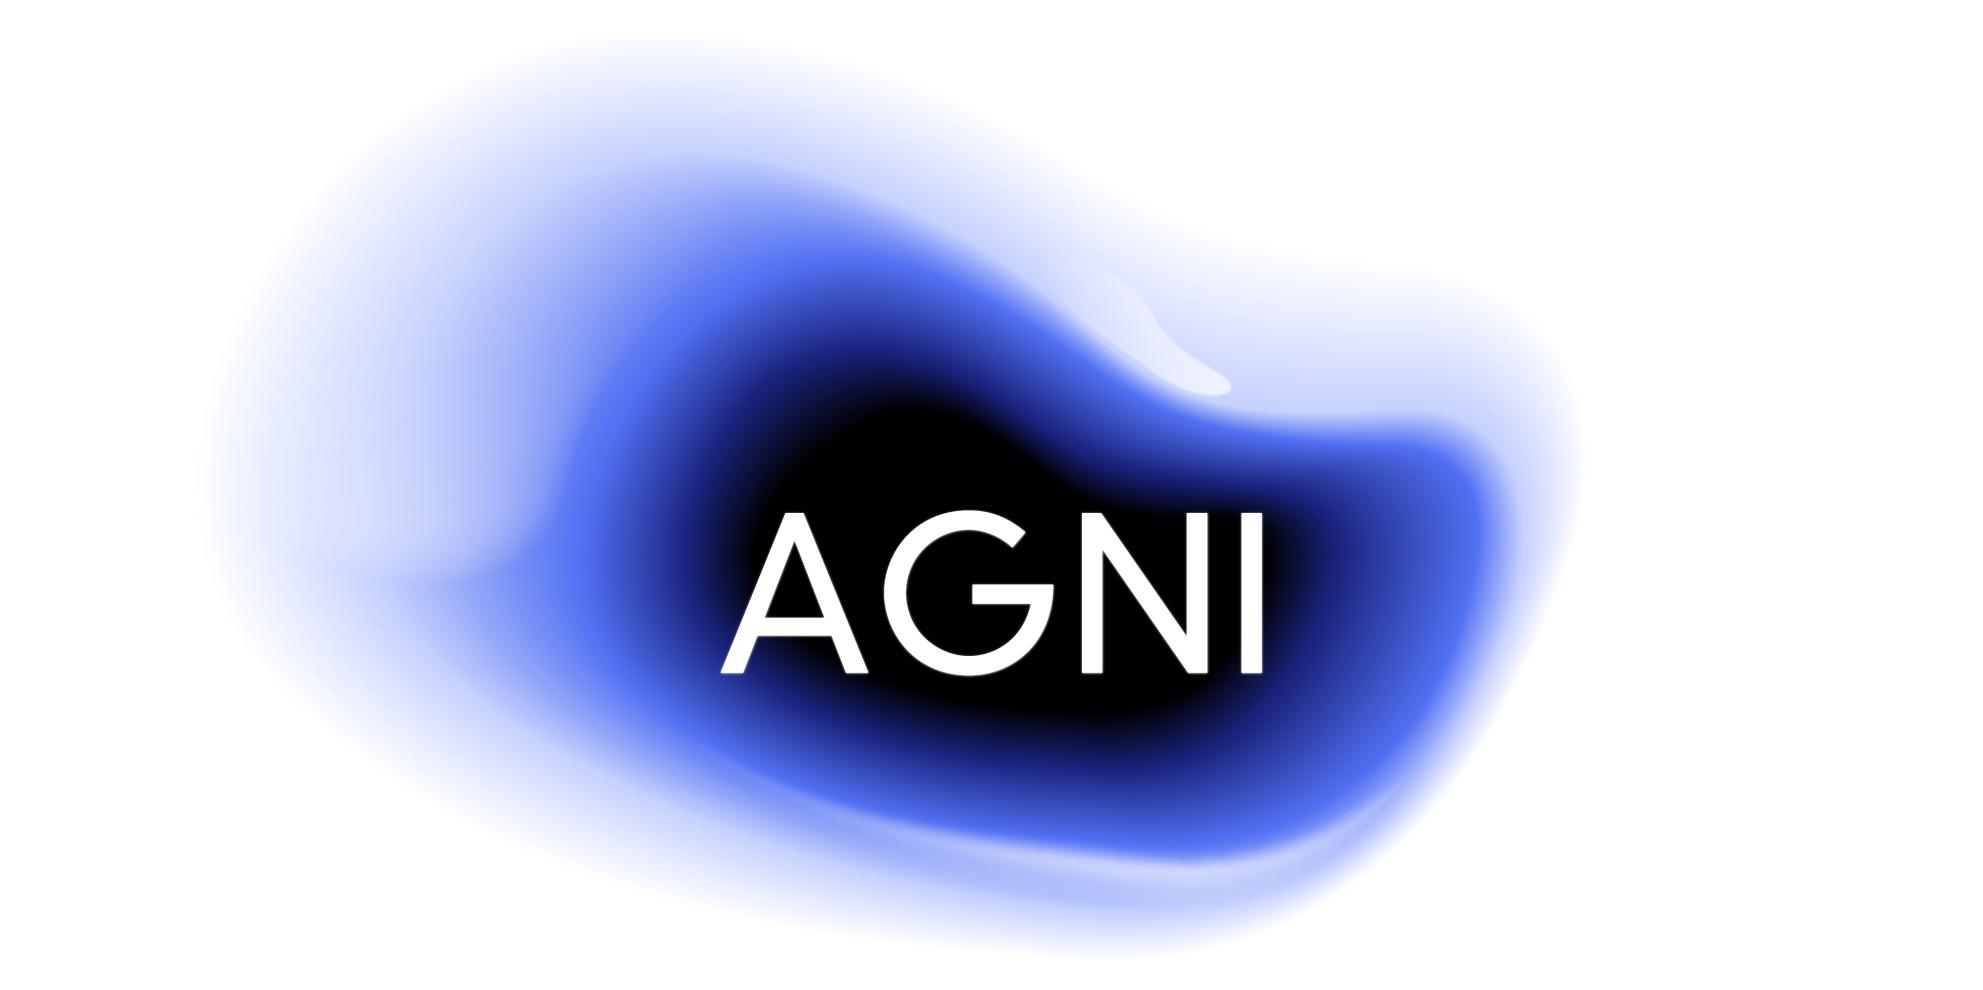 AGNI_Plasma Background [1]-01.png